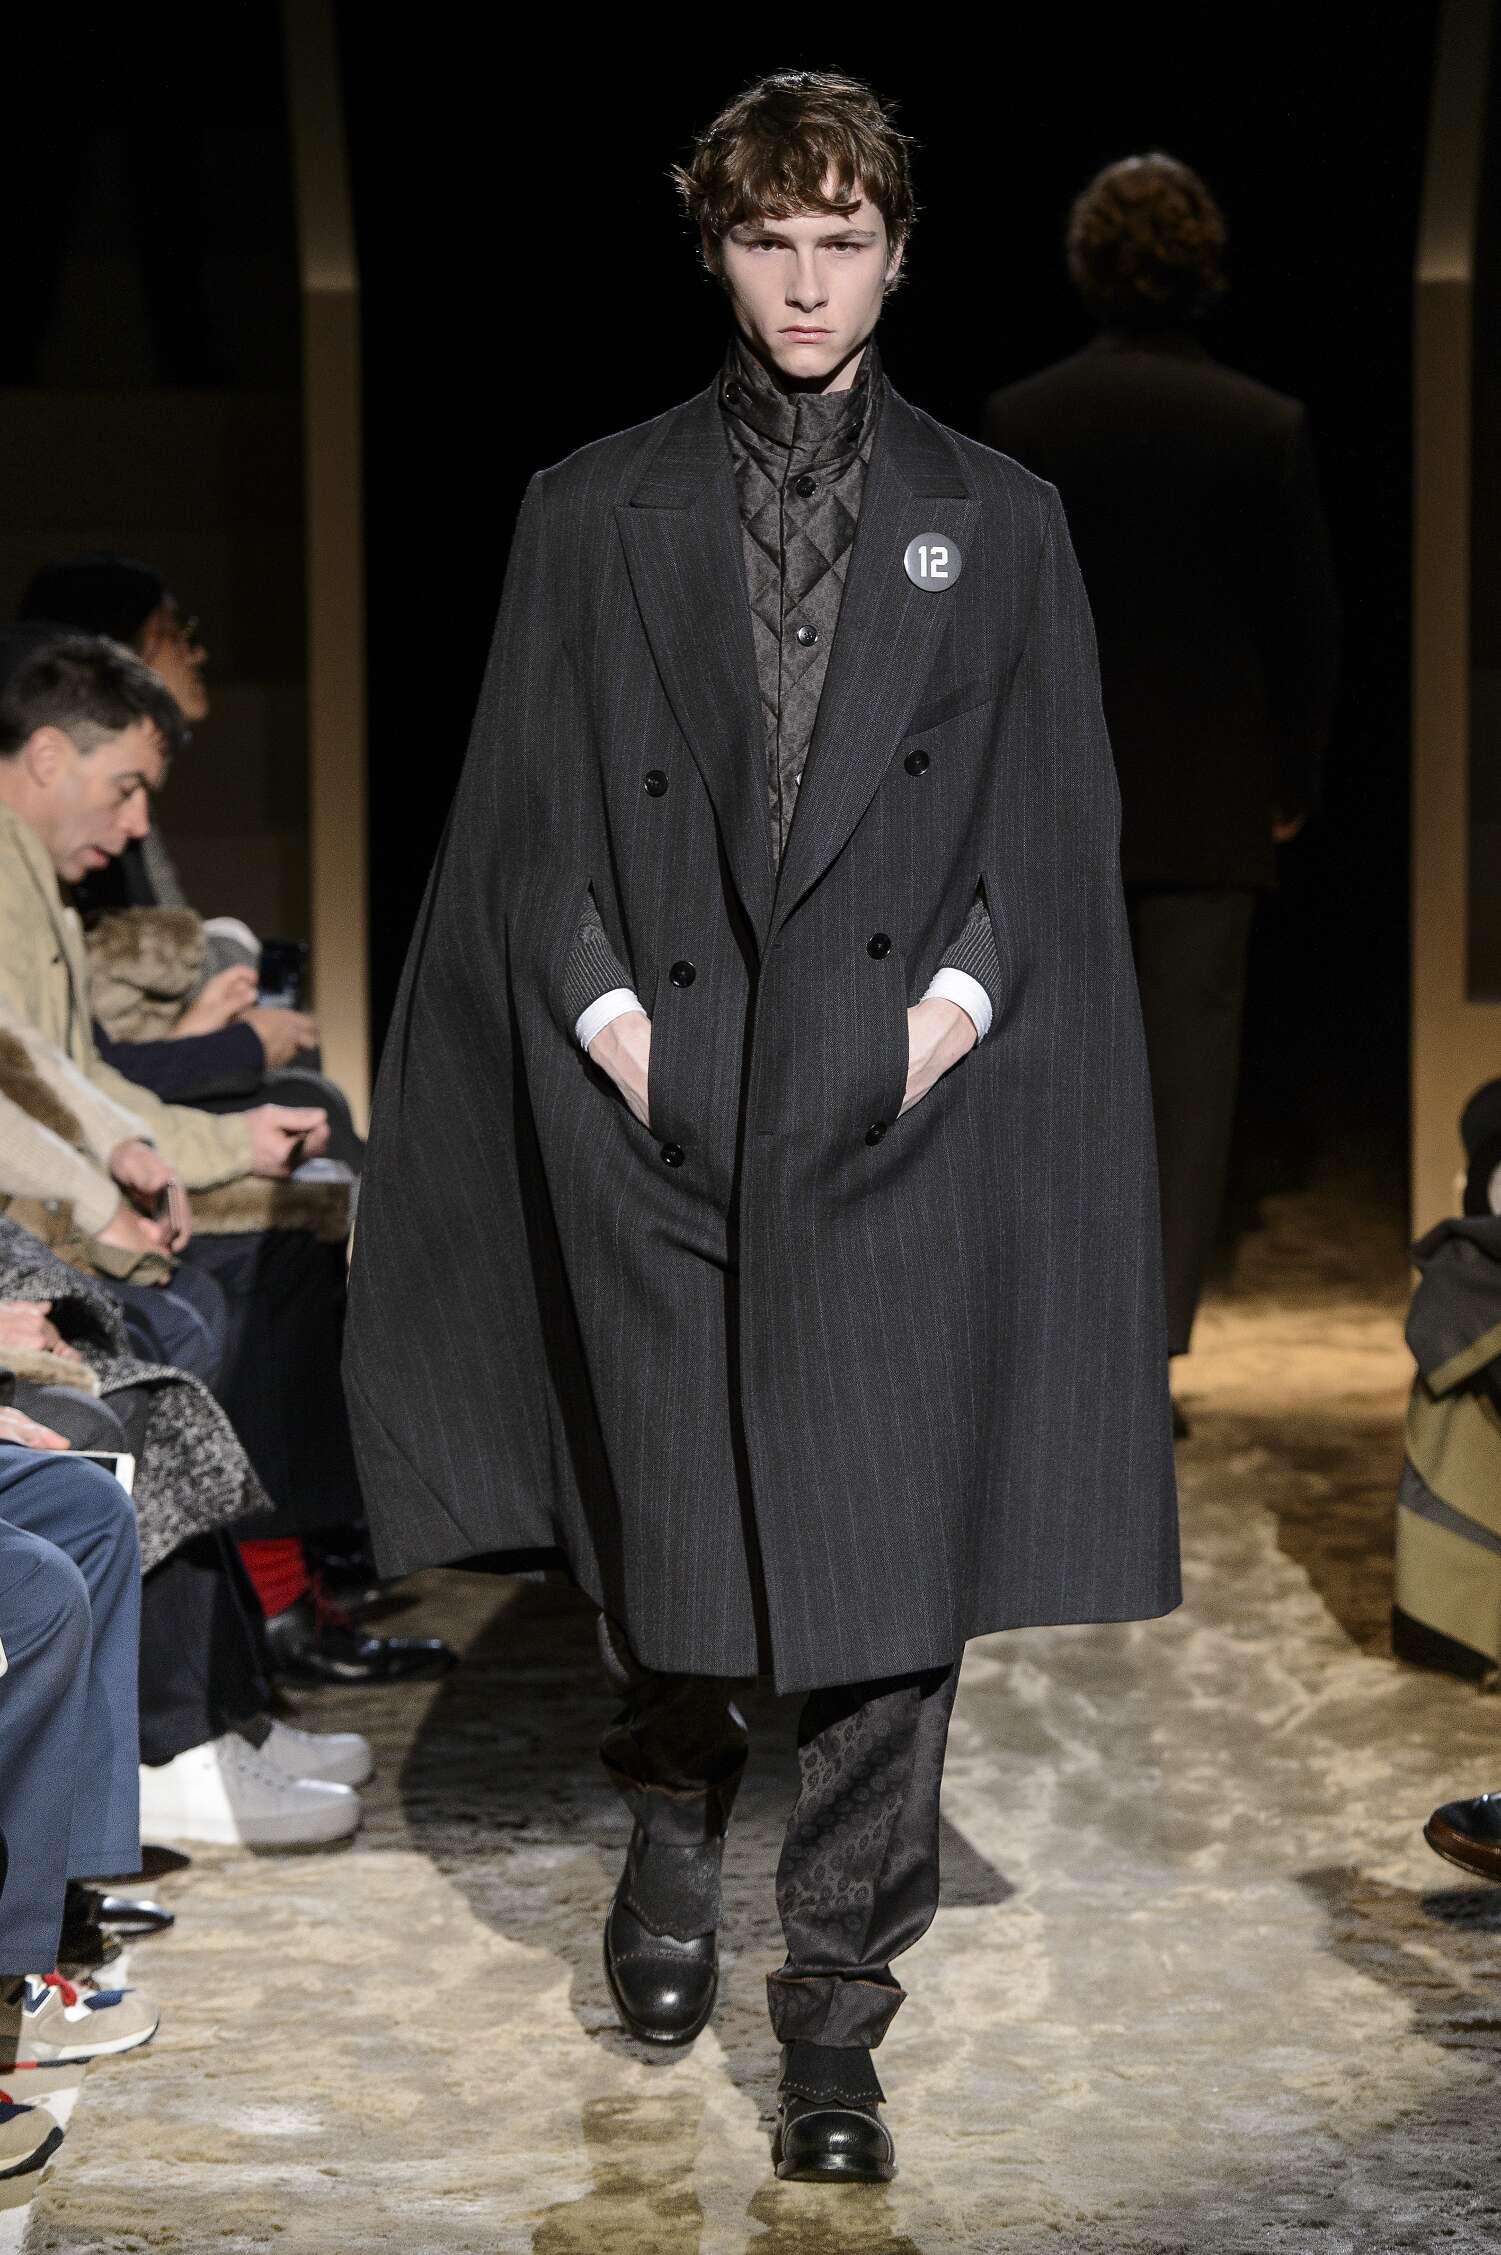 Winter 2016 17 Man Trends Ermenegildo Zegna Couture